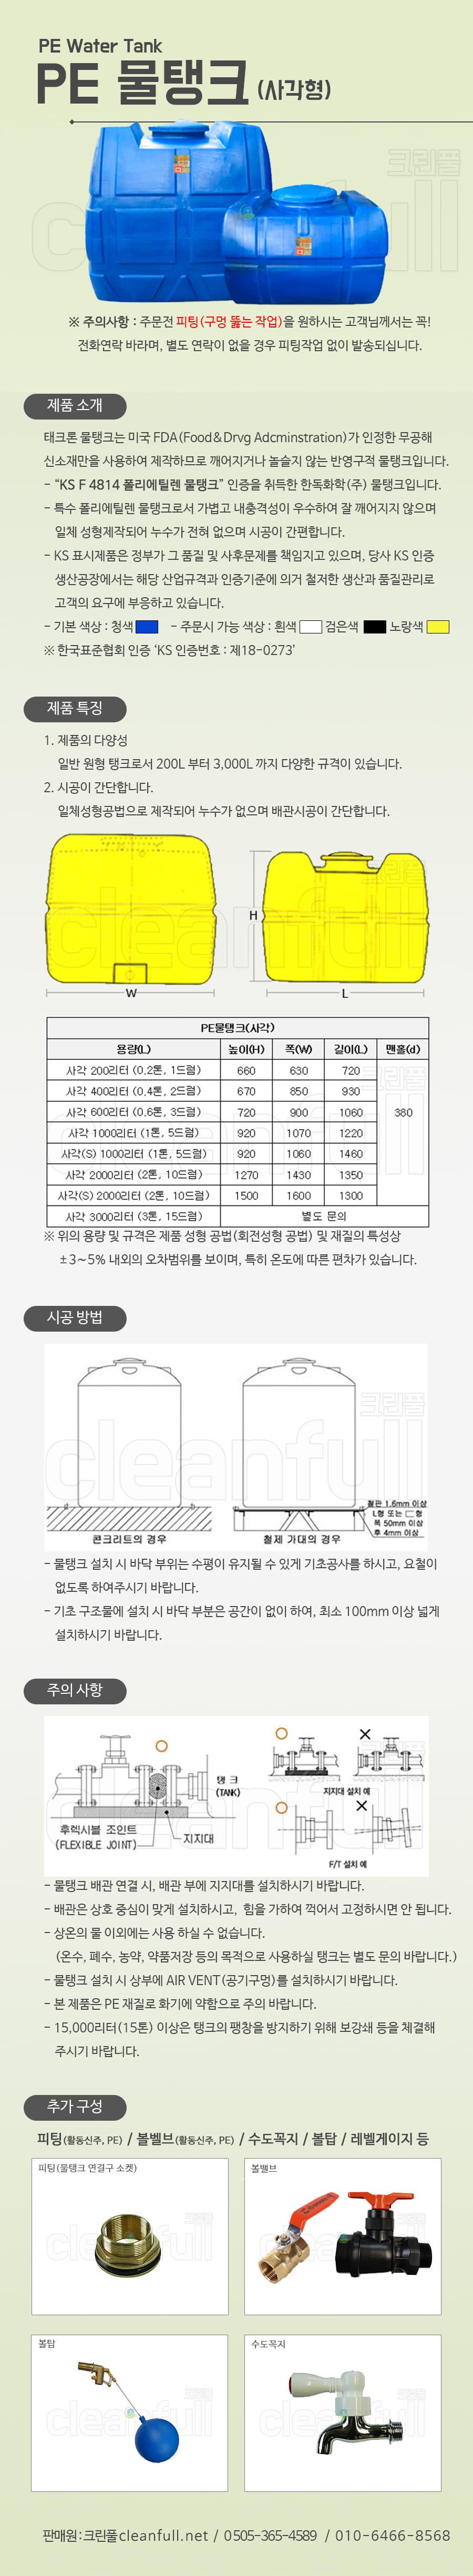 PE물탱크 1톤(1000리터)_KS인증제품_한독산업_한독물탱크